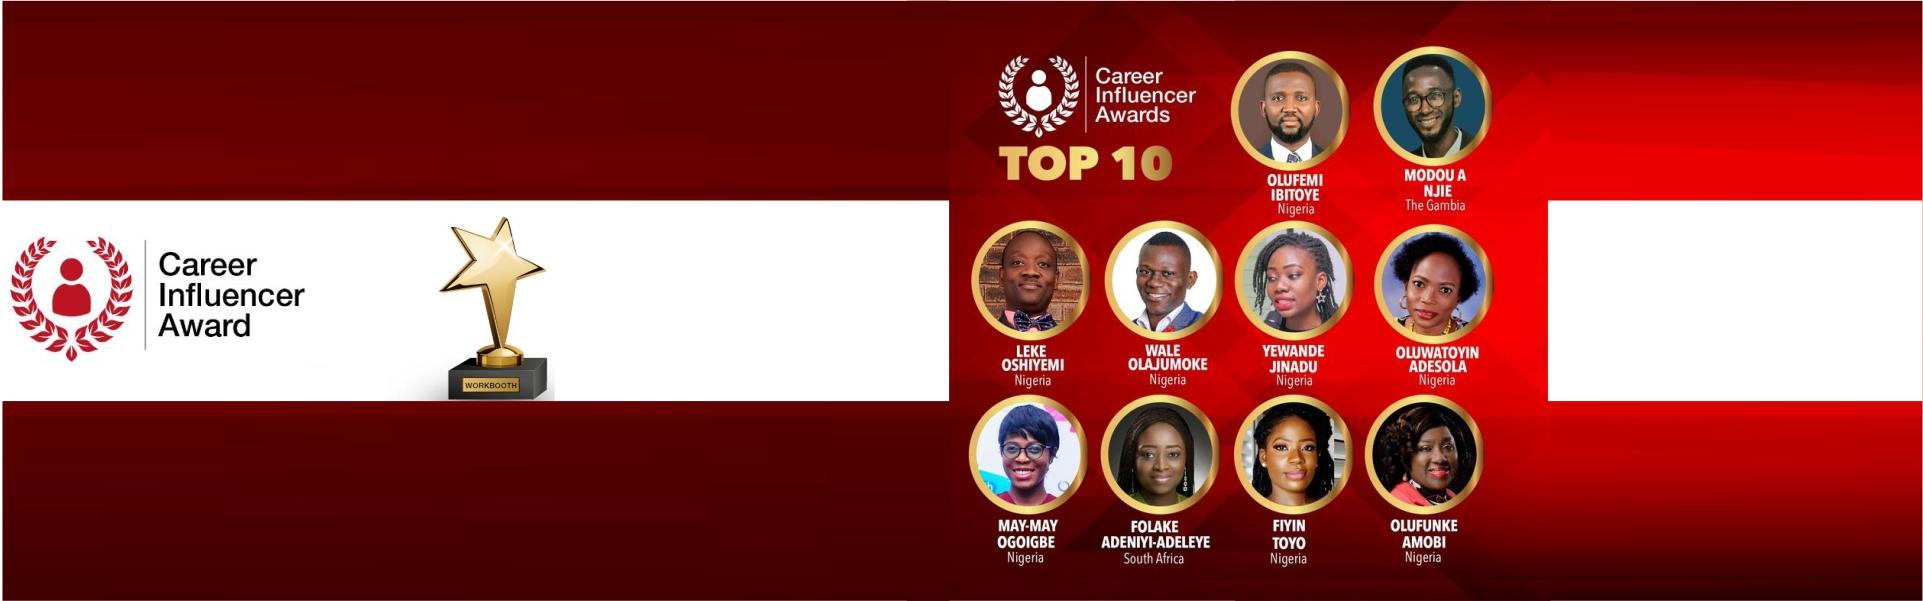 Workbooth Career Influencer Awards